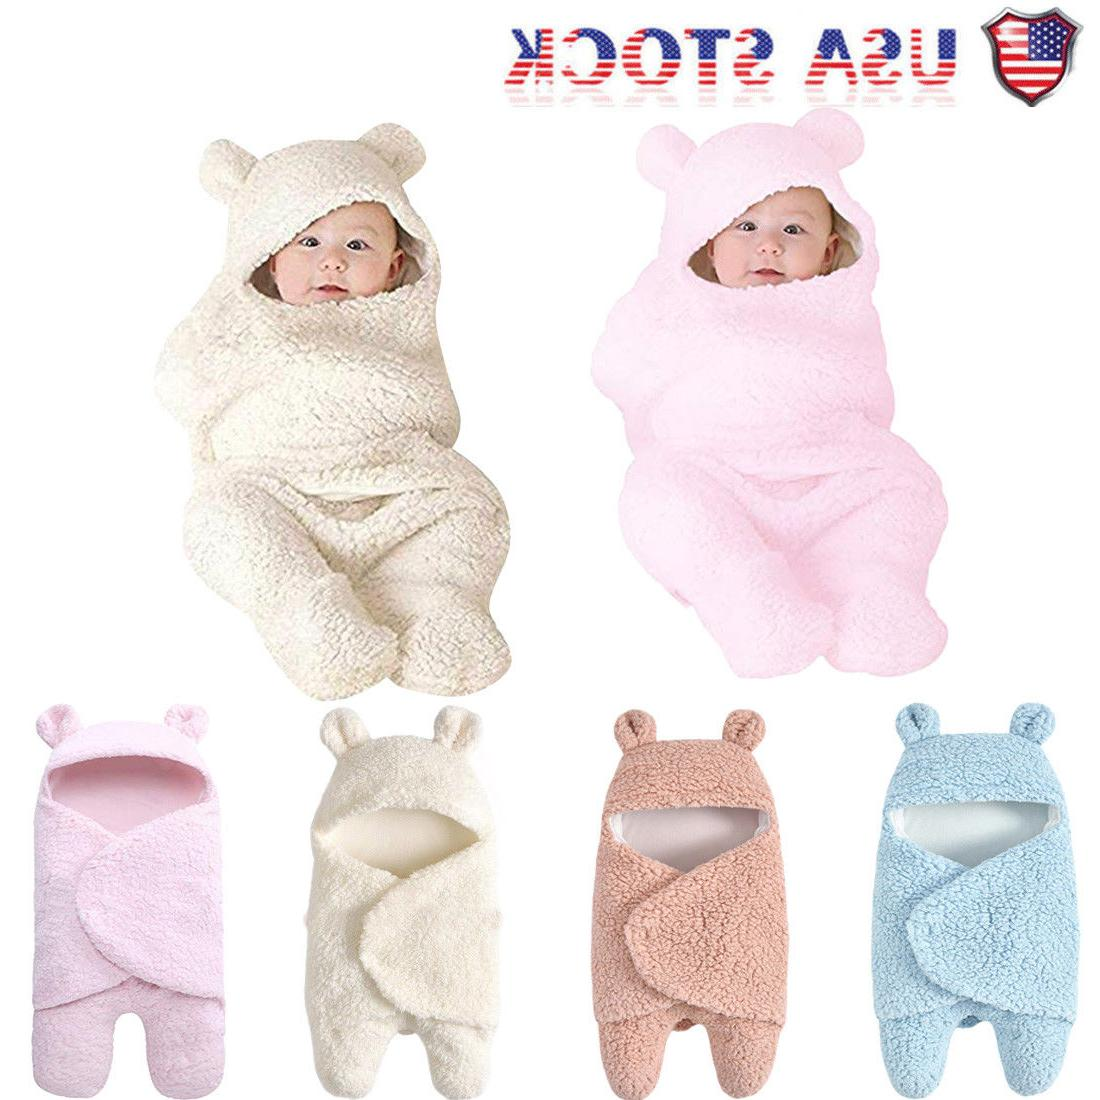 newborn baby cute cotton receiving white sleeping